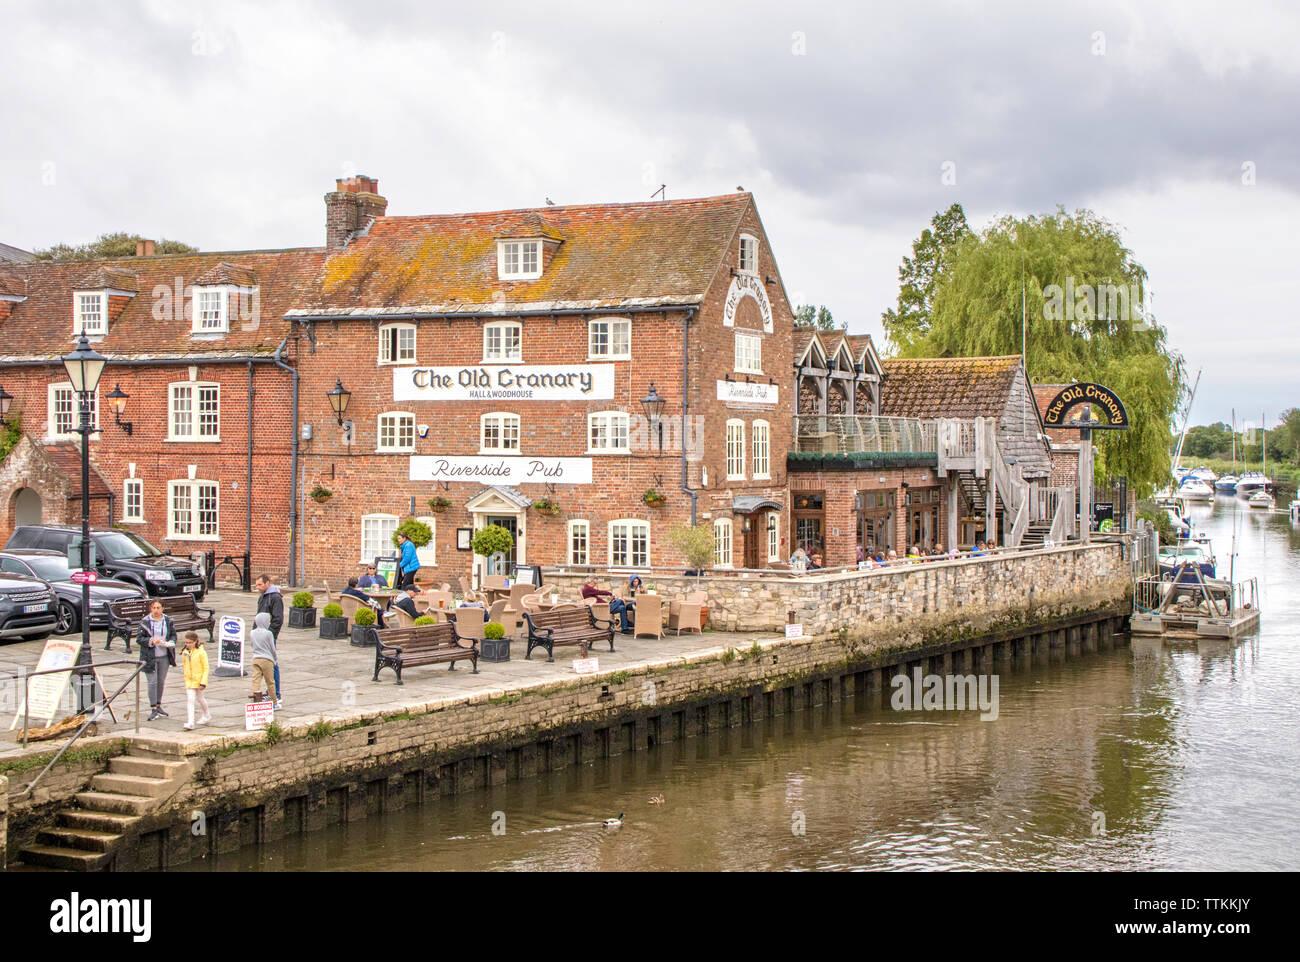 Wareham Quay in Historic Wareham, Dorset, England, UK - Stock Image